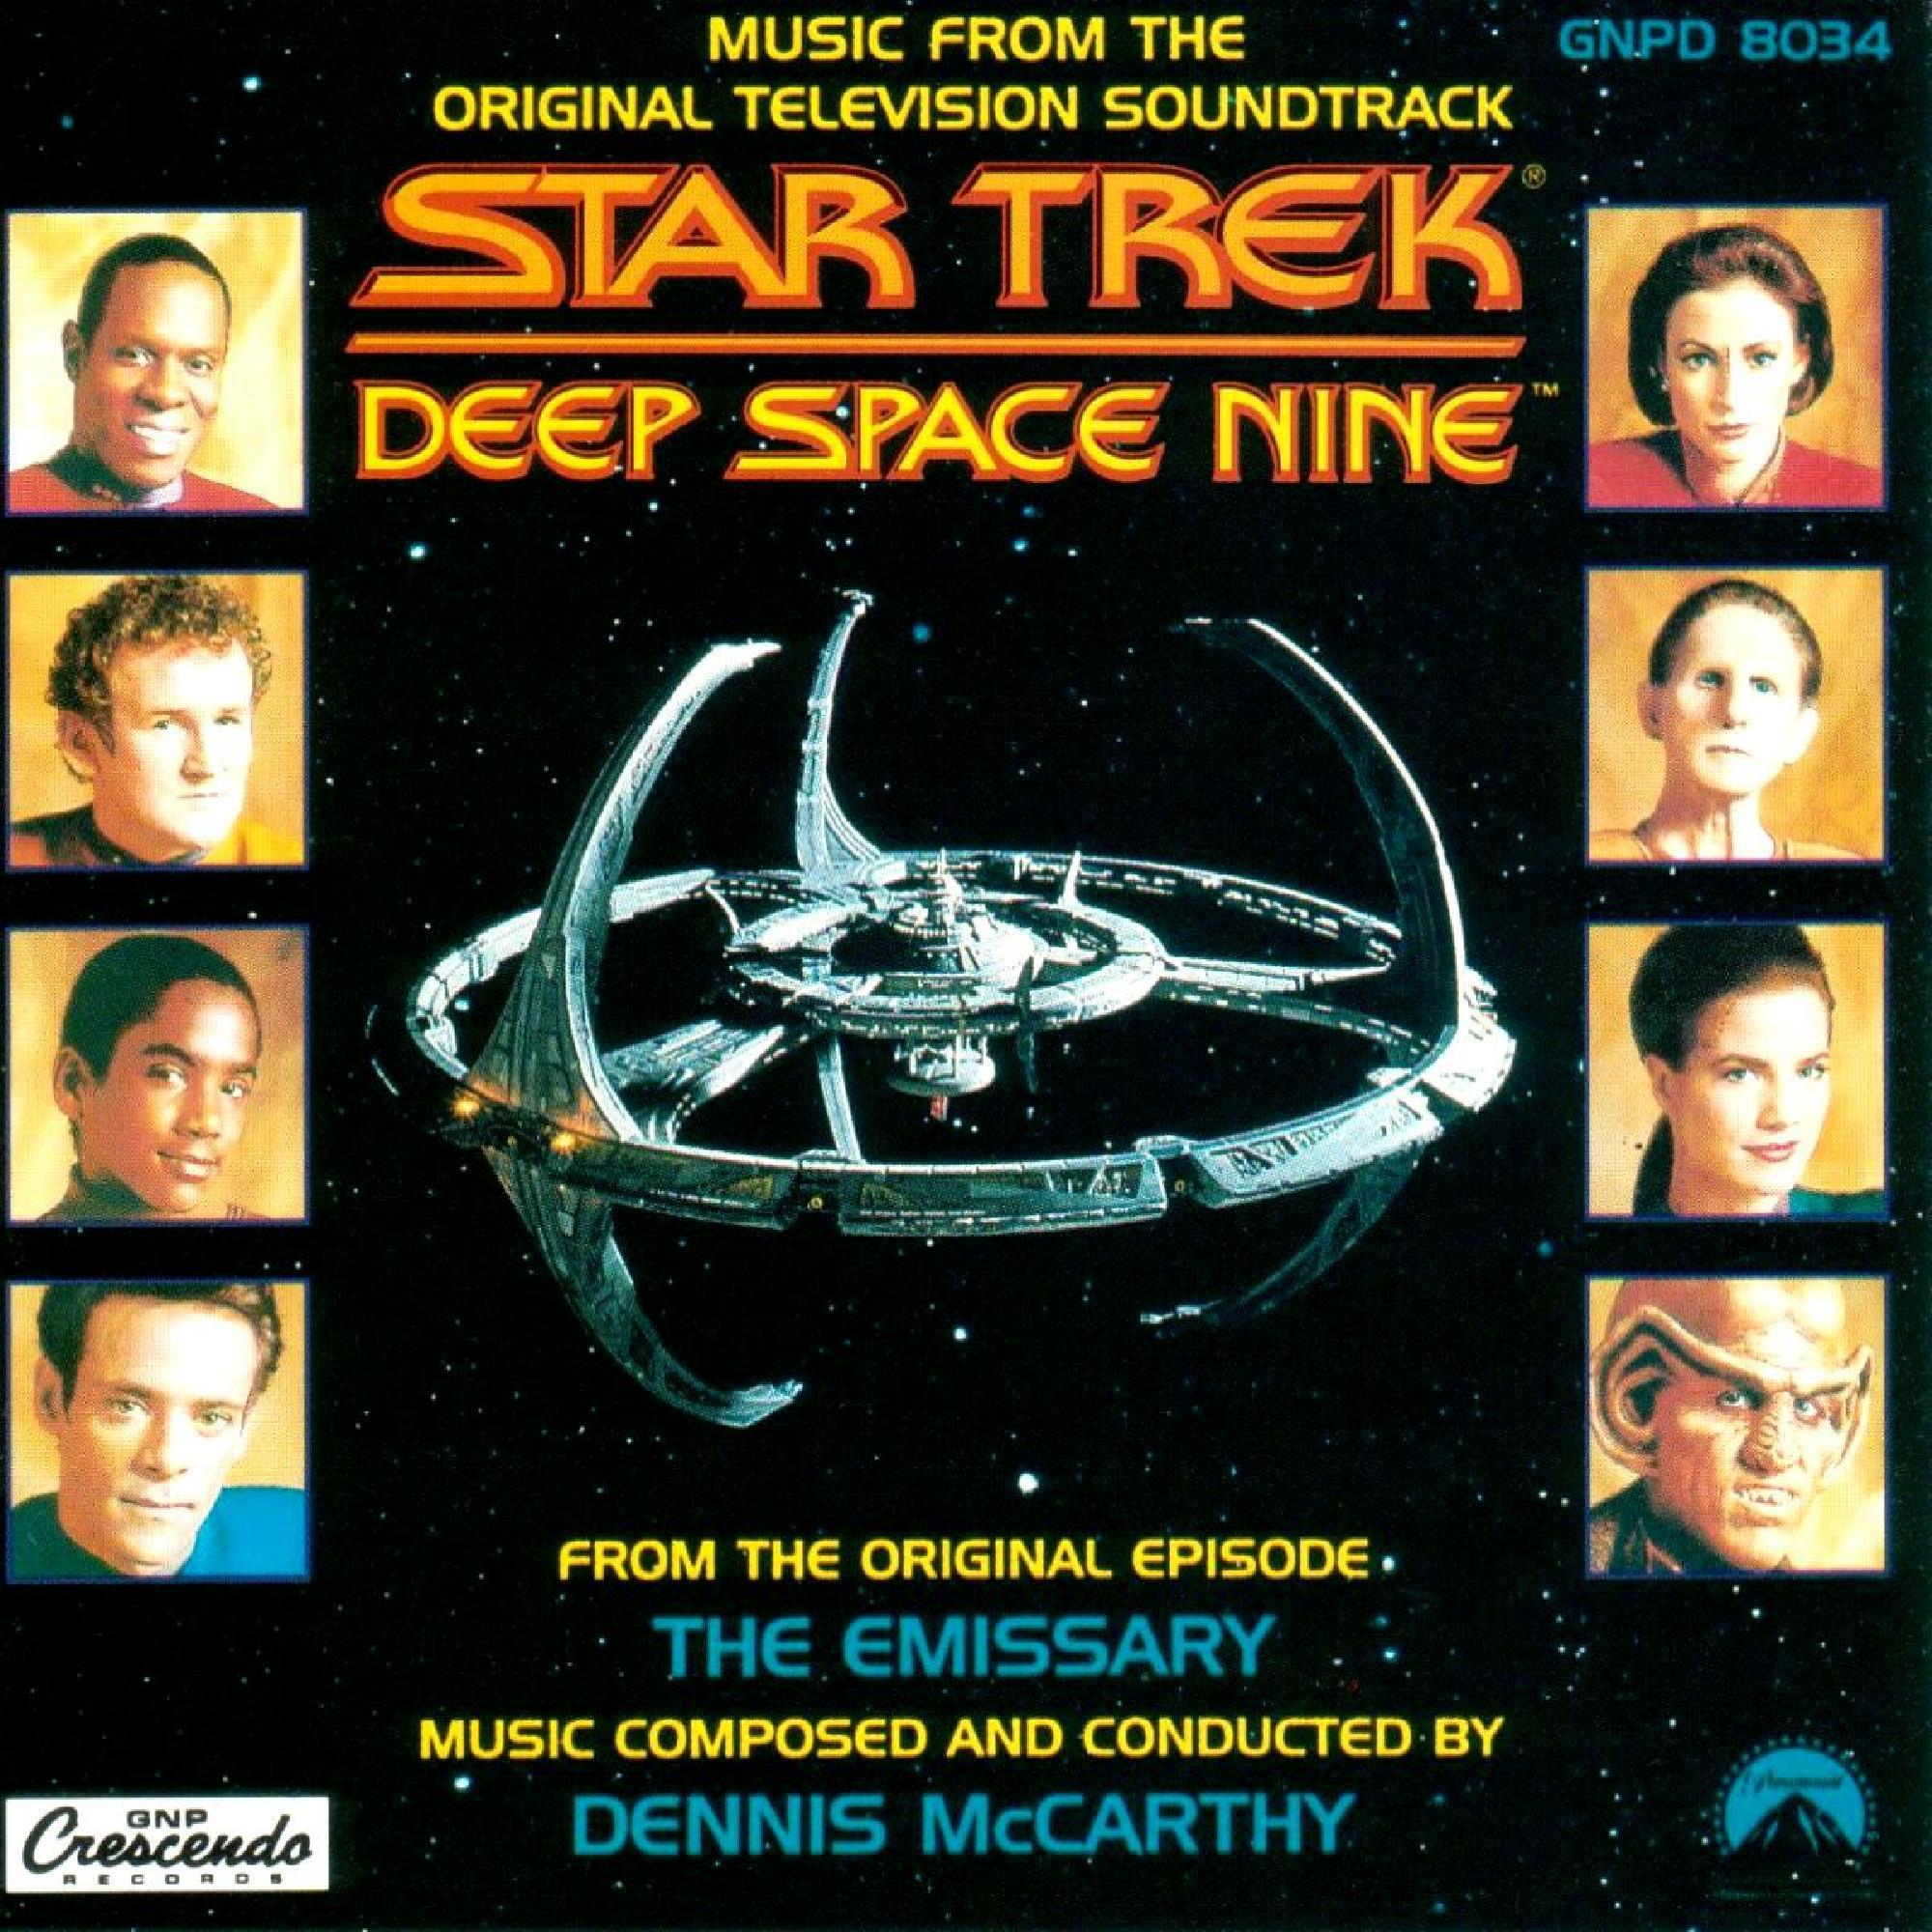 Star Trek: Deep Space Nine – The Emissary